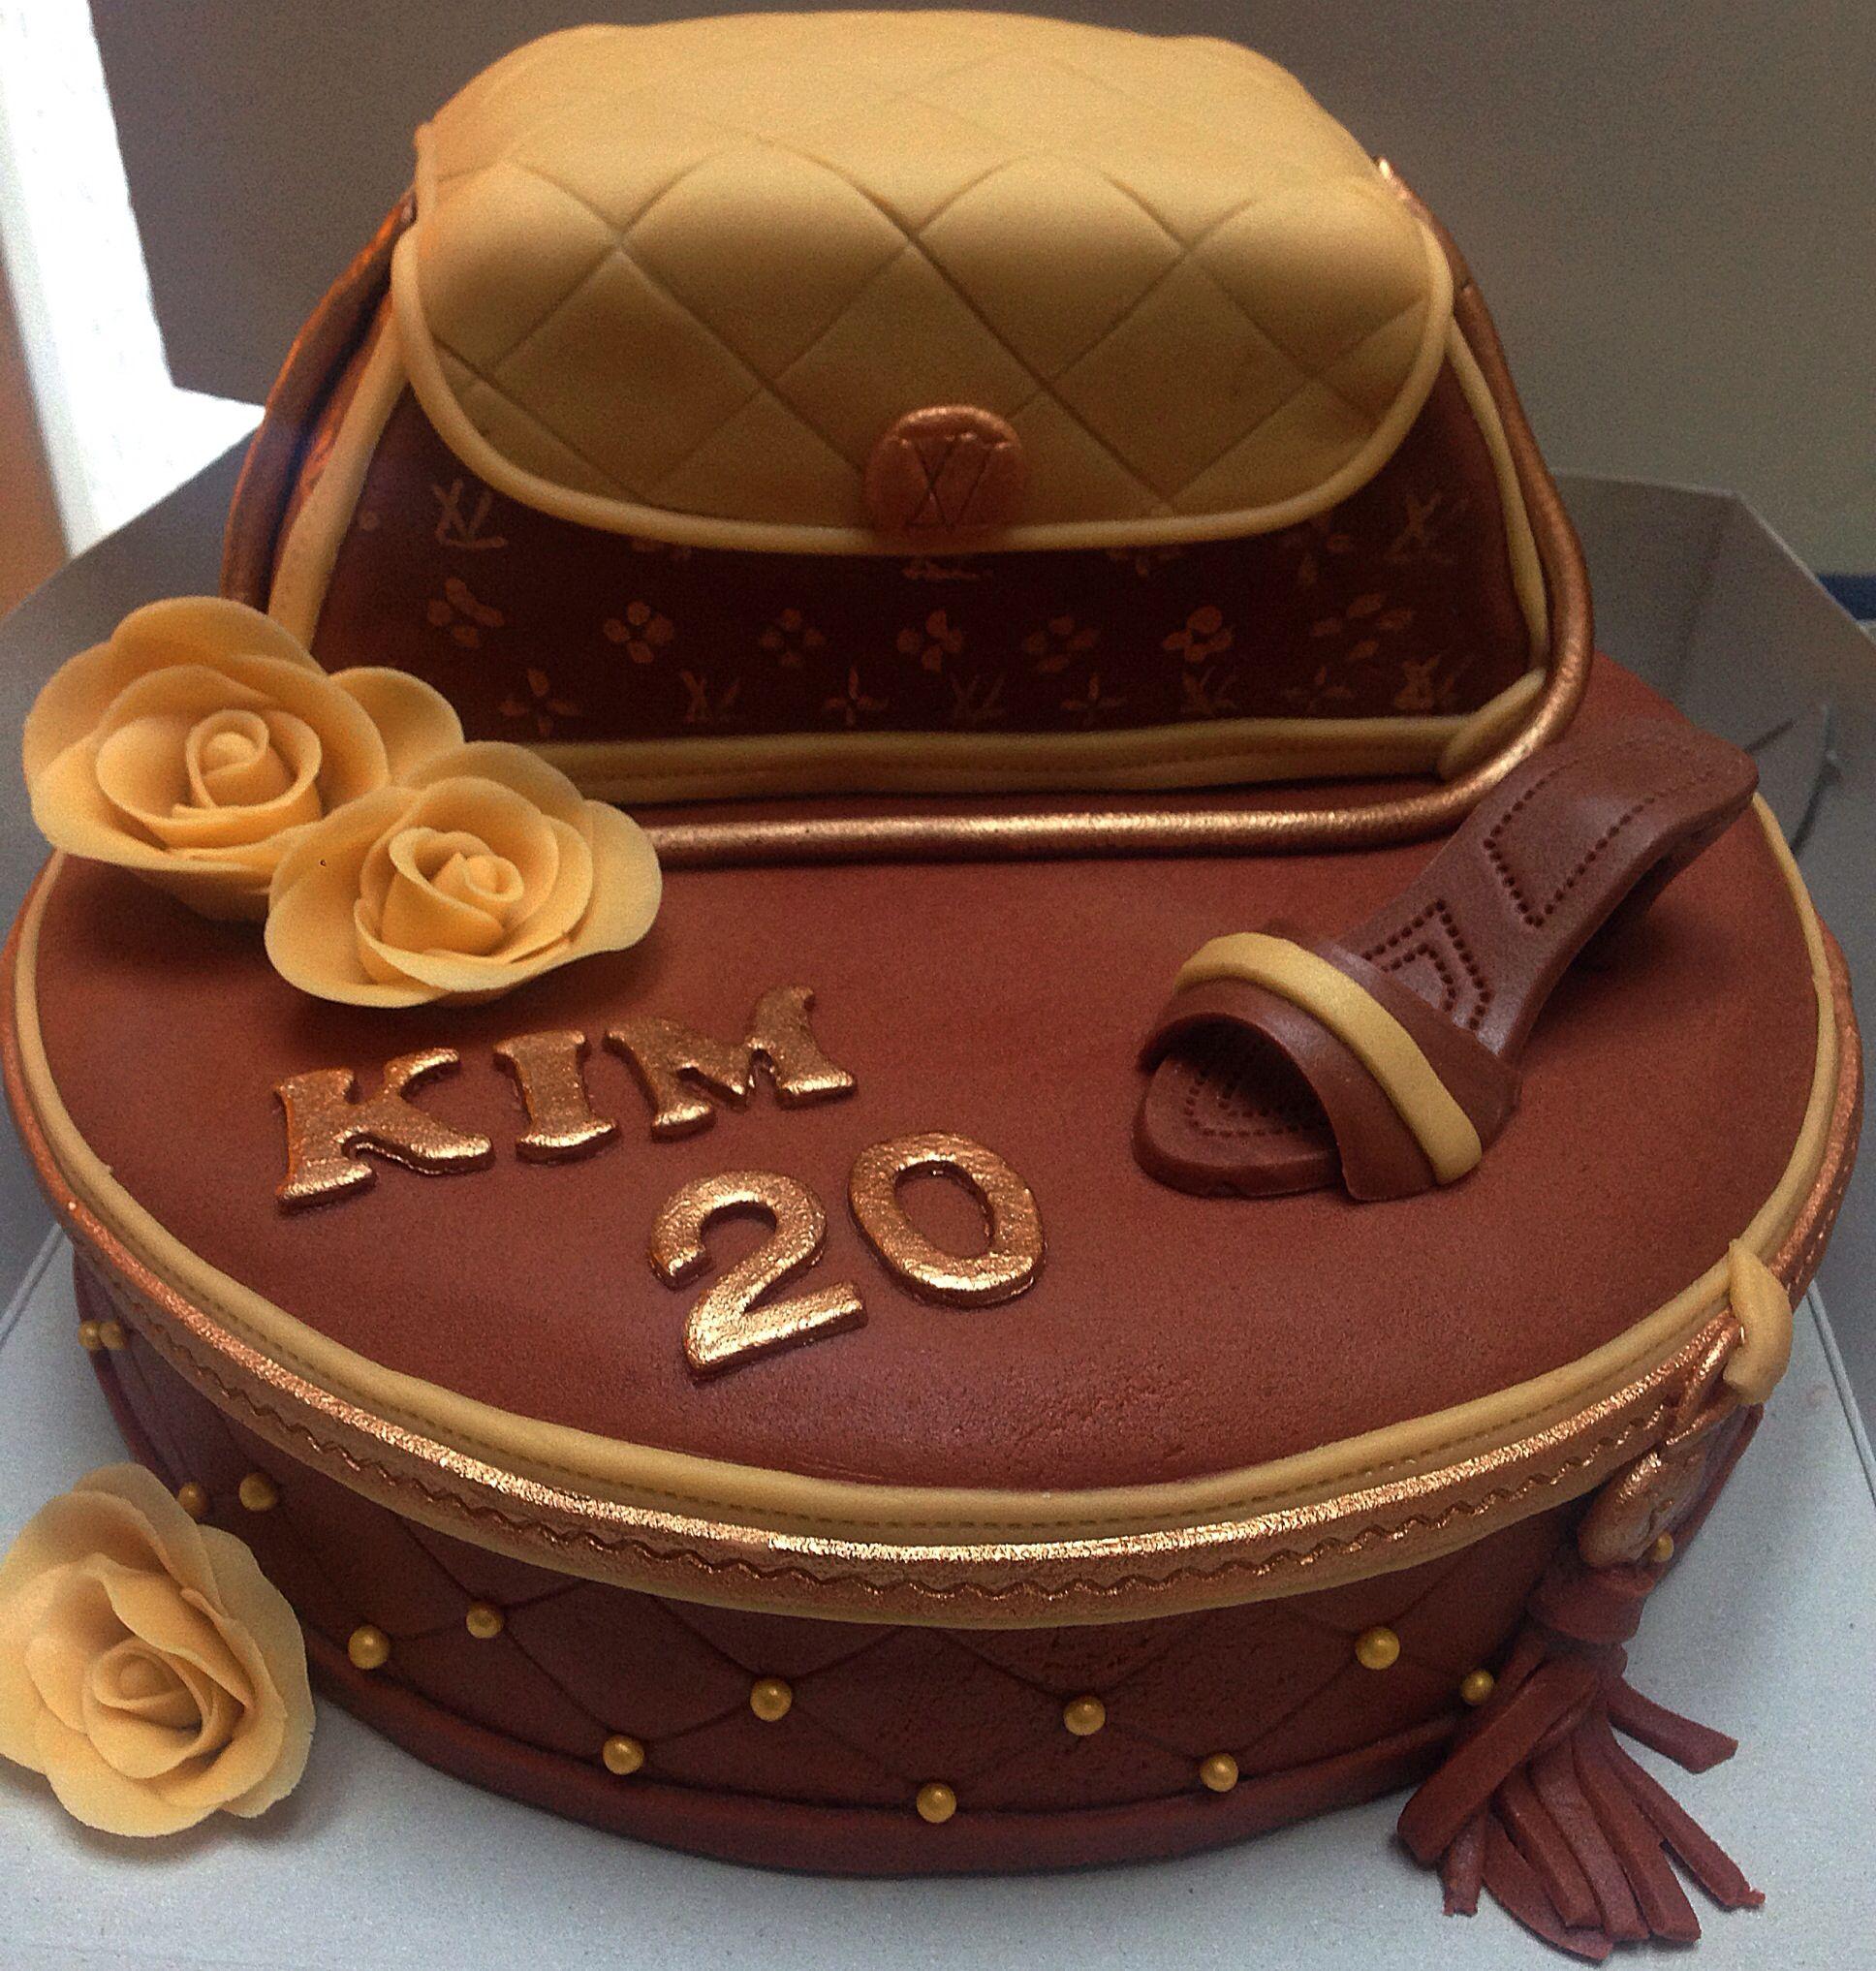 Cake Louis Vuitton Pinterest : Louis vuitton cake Designer Cakes Pinterest